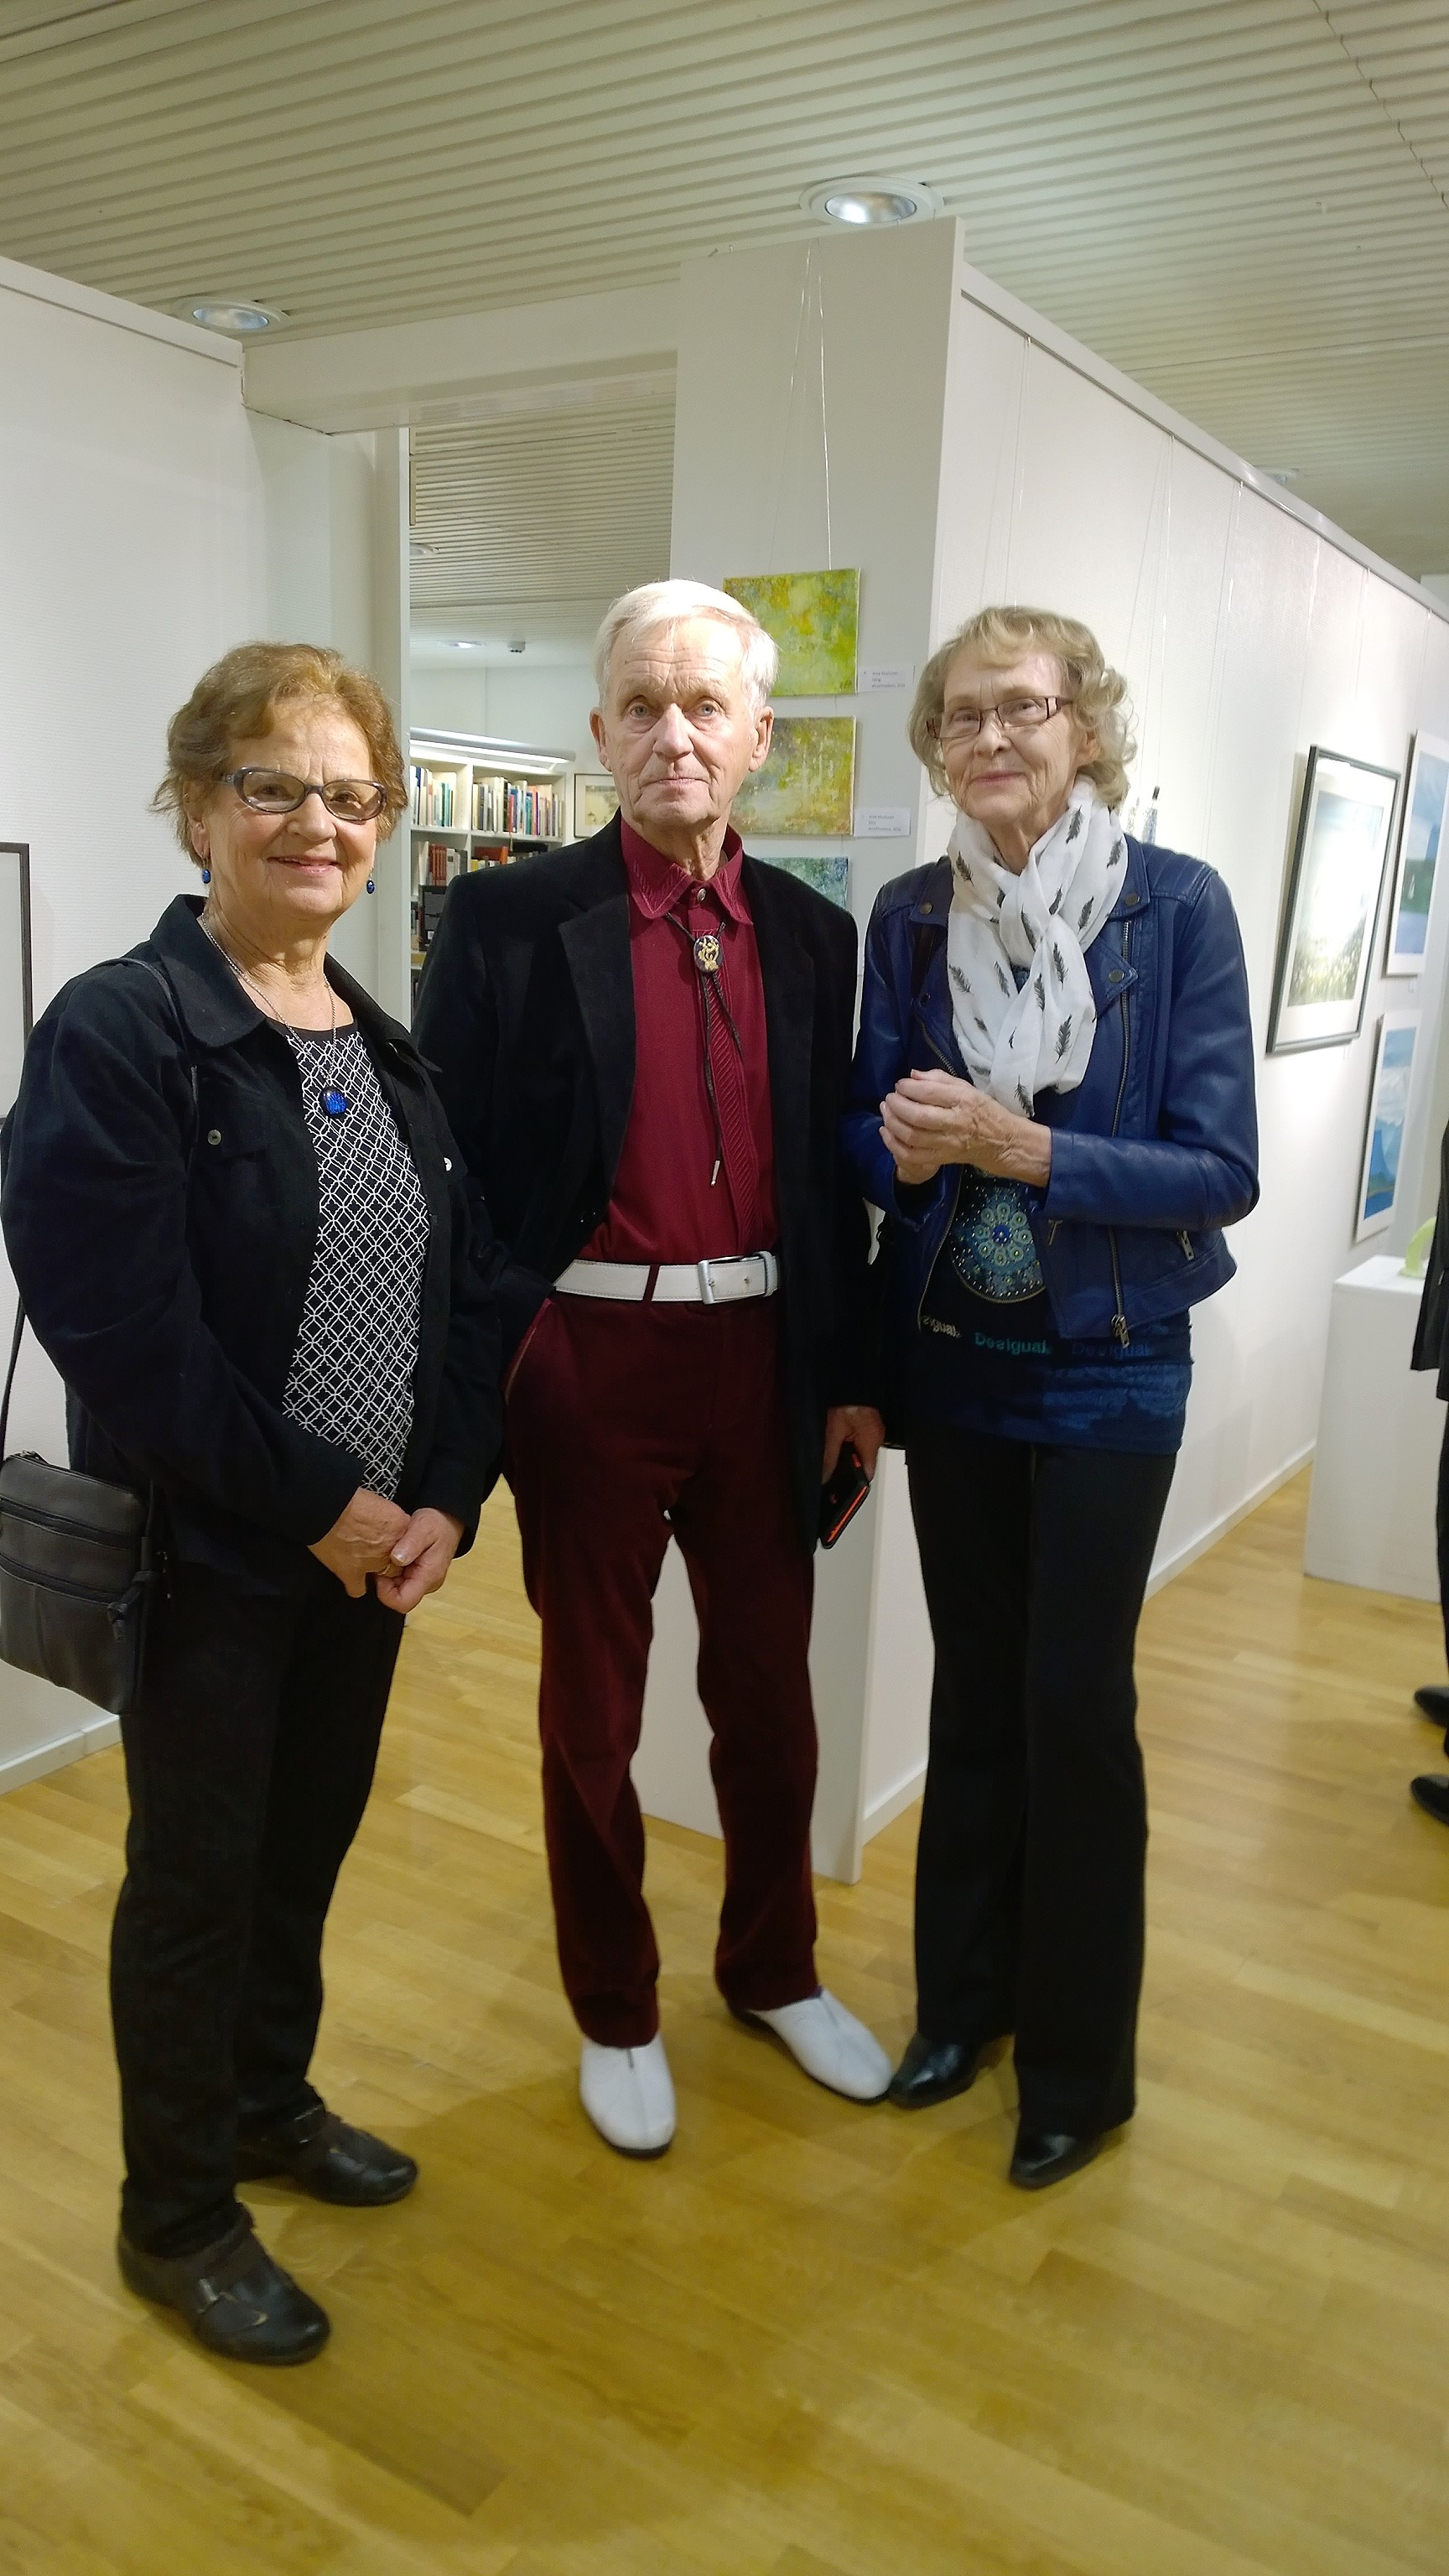 Helena ja Matti Rapakko, Suoma Yli-Suvanto